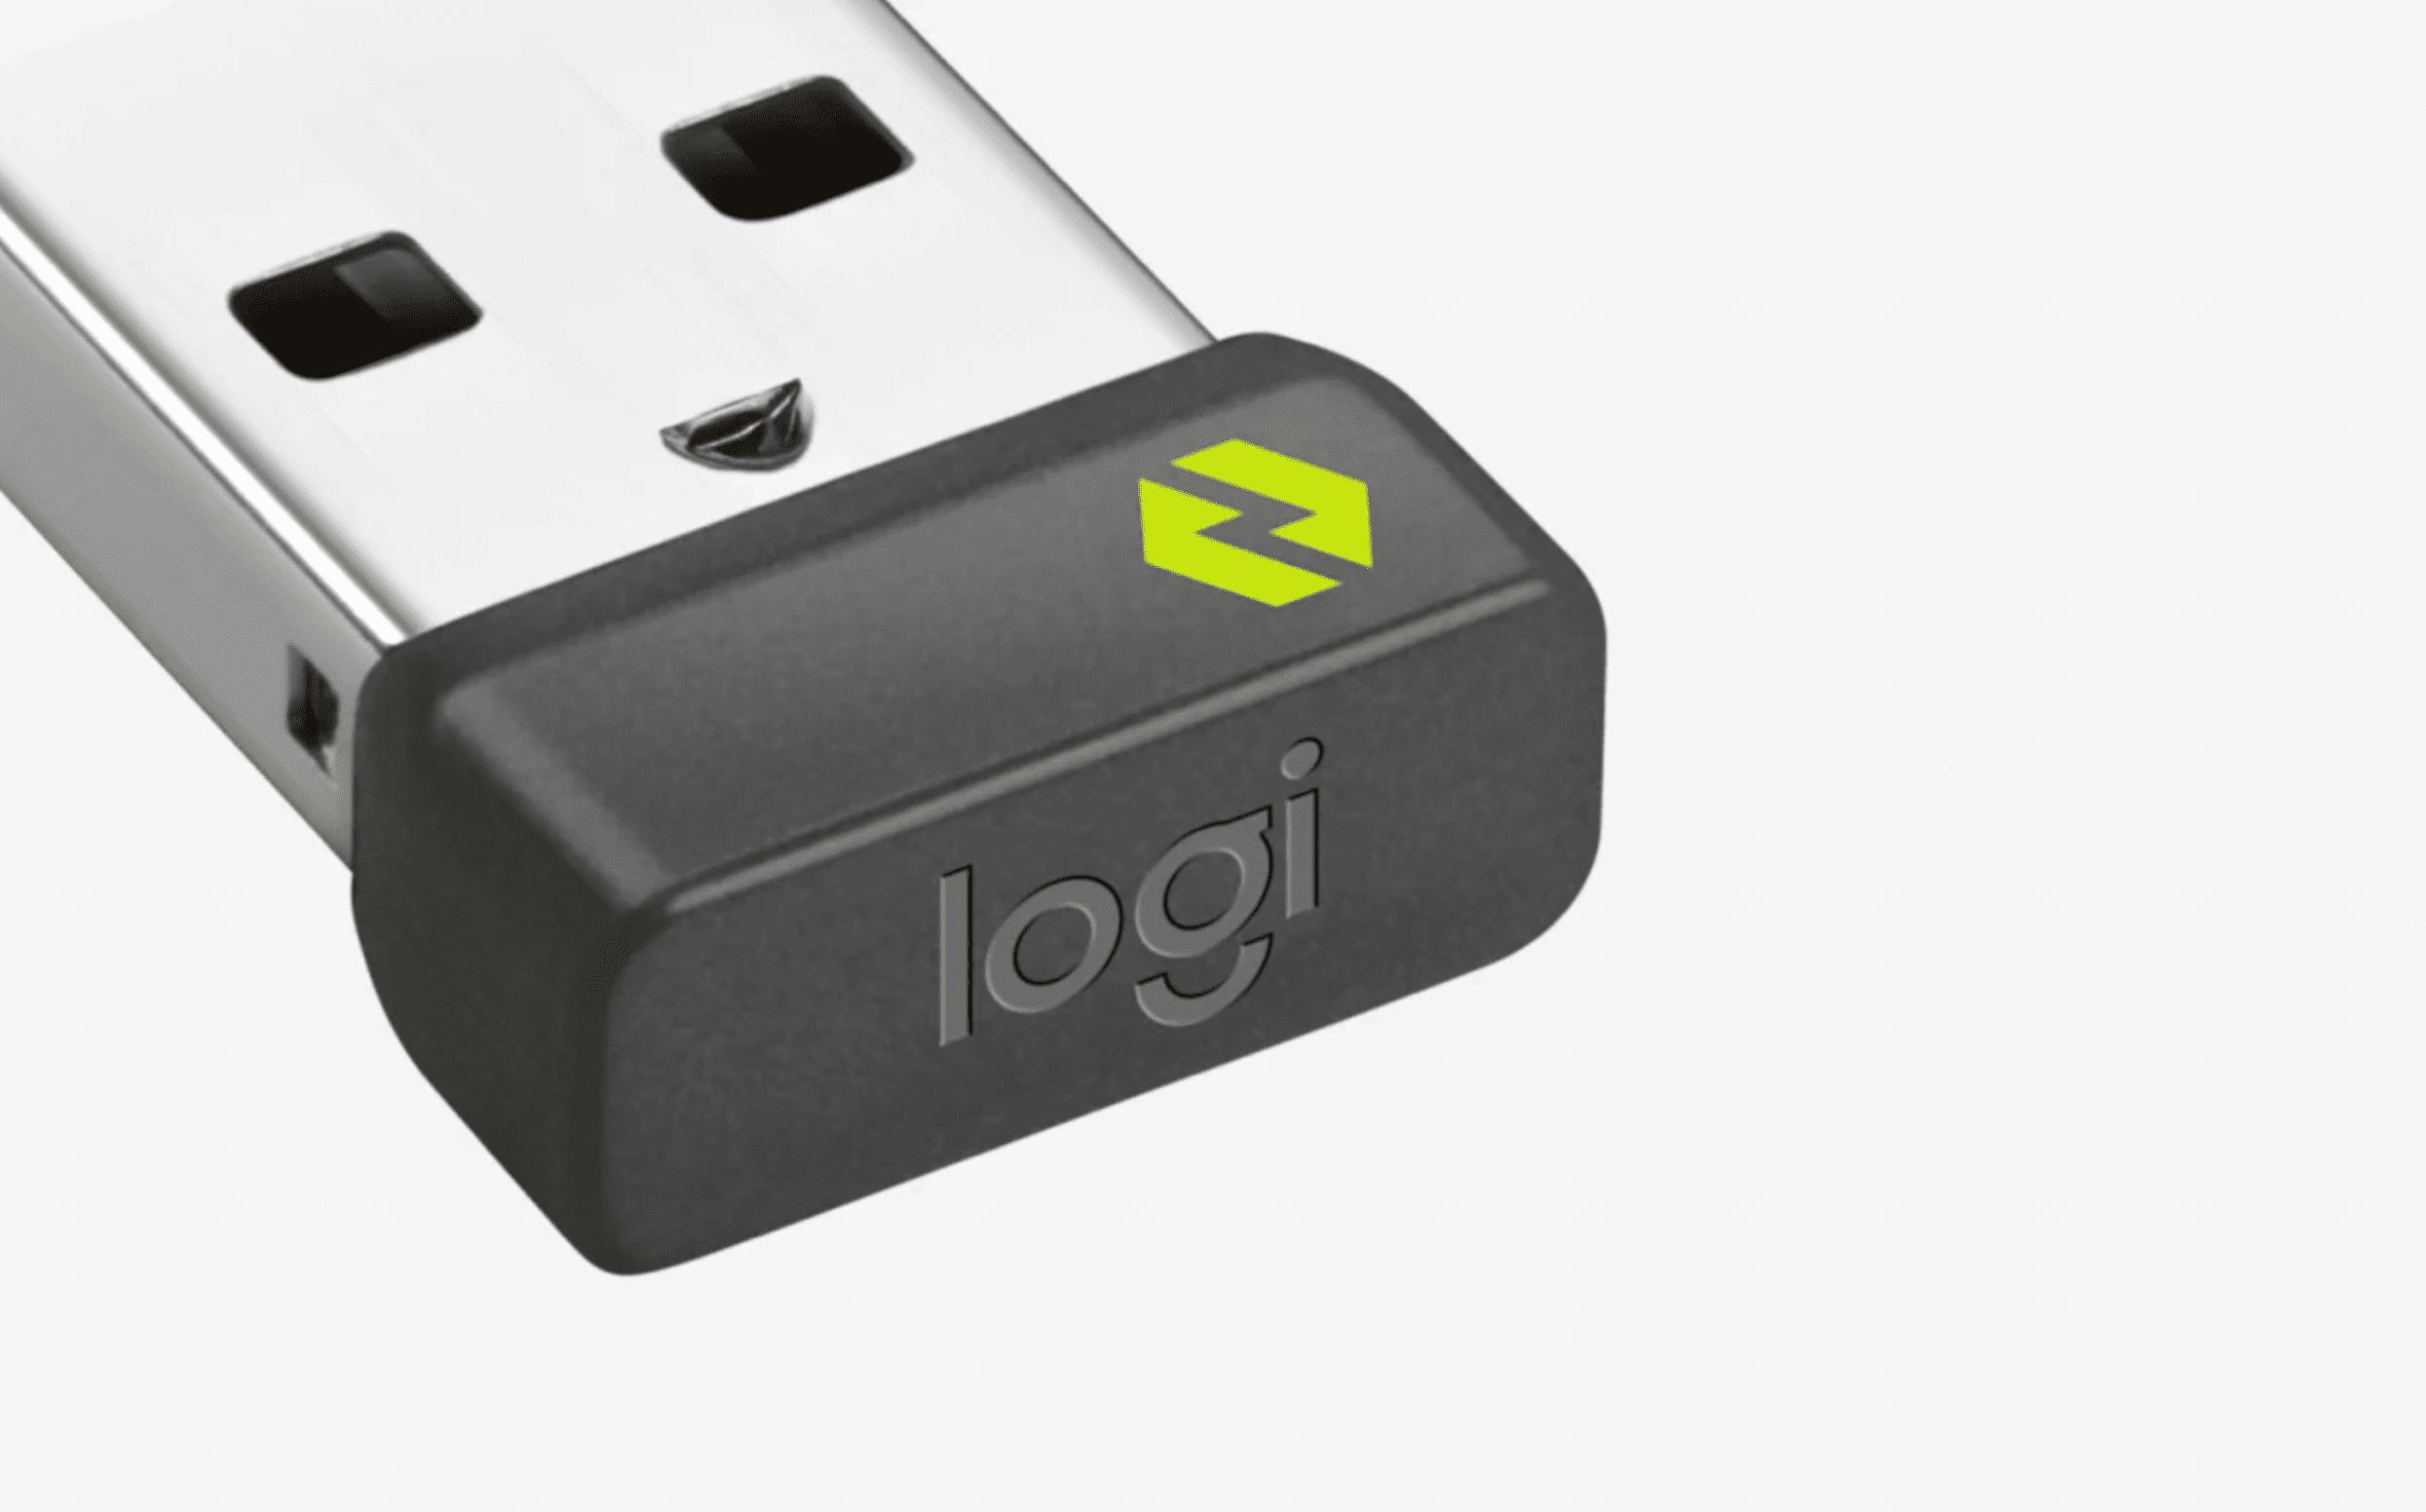 Logi Bolt USB dongle